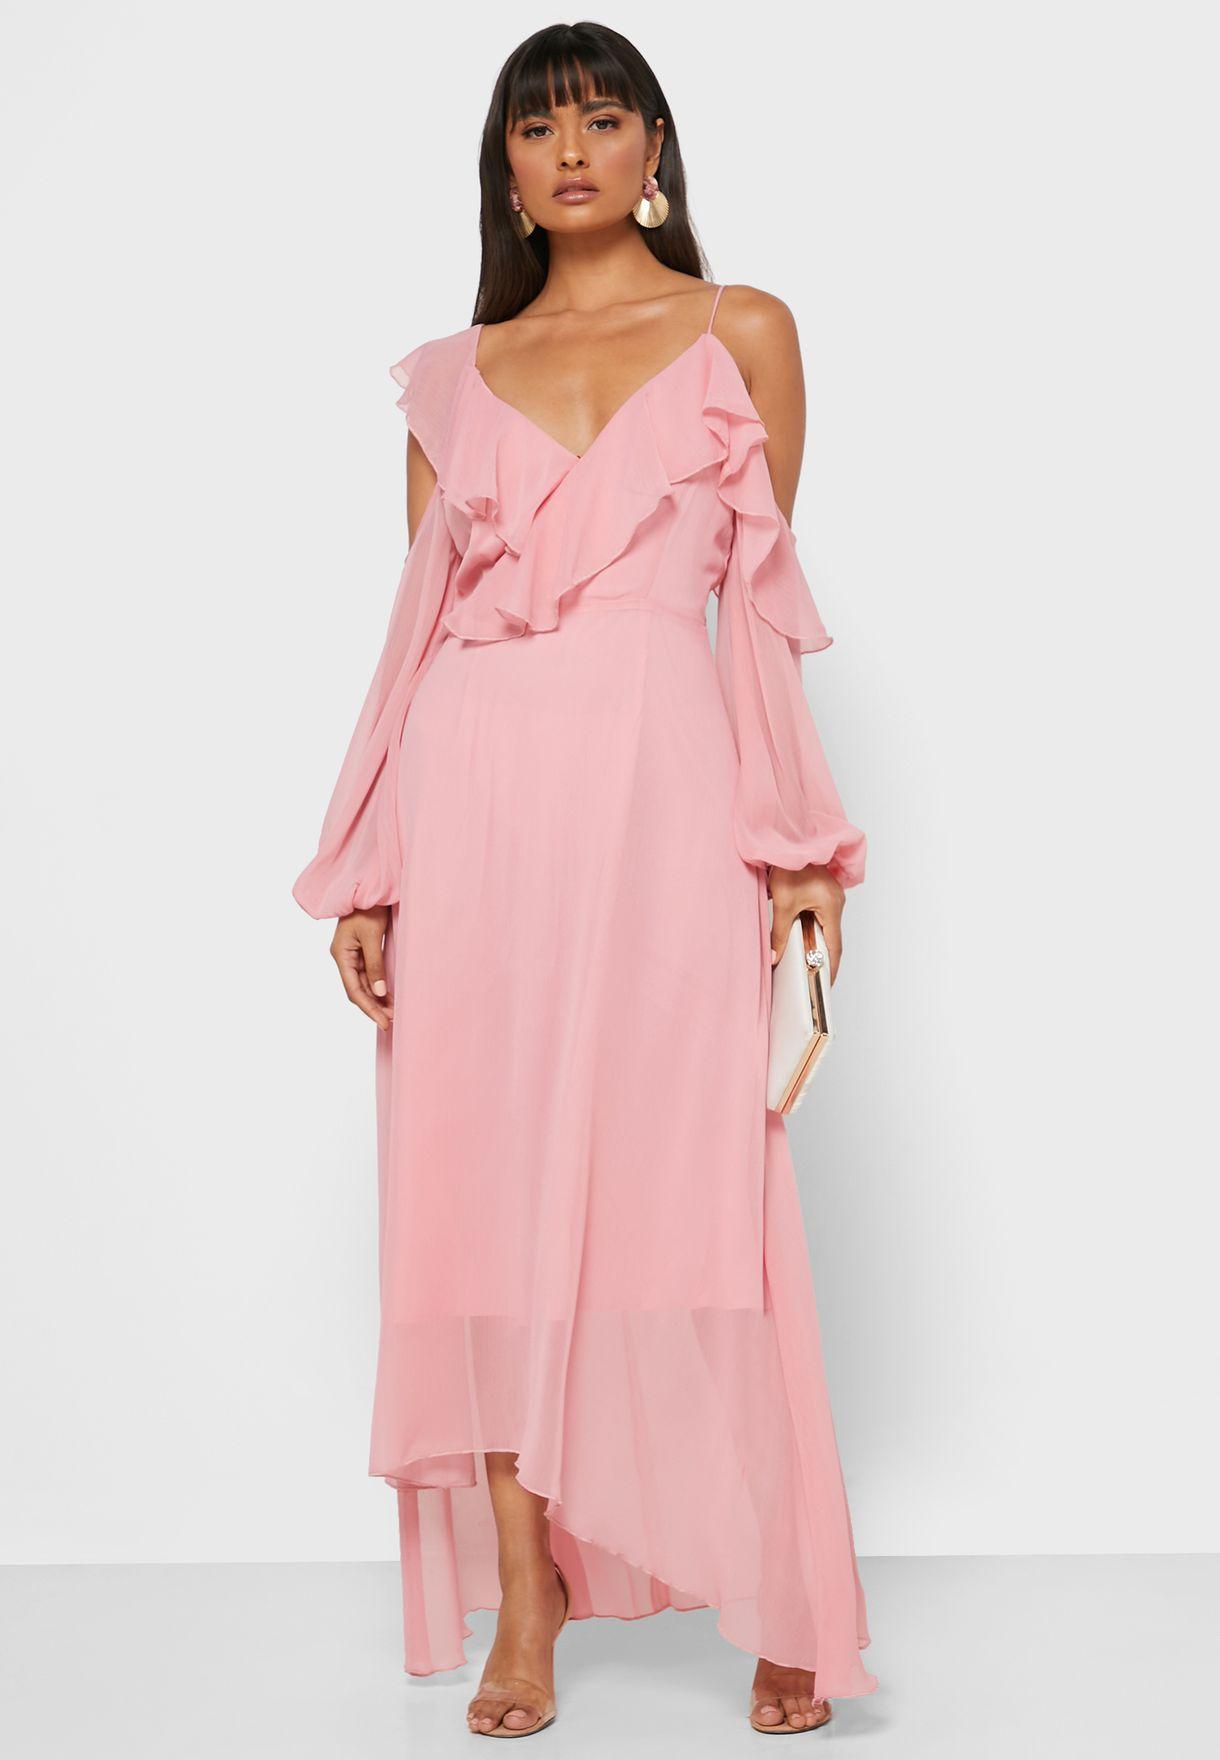 Ruffle One Cold Shoulder Midi Dress